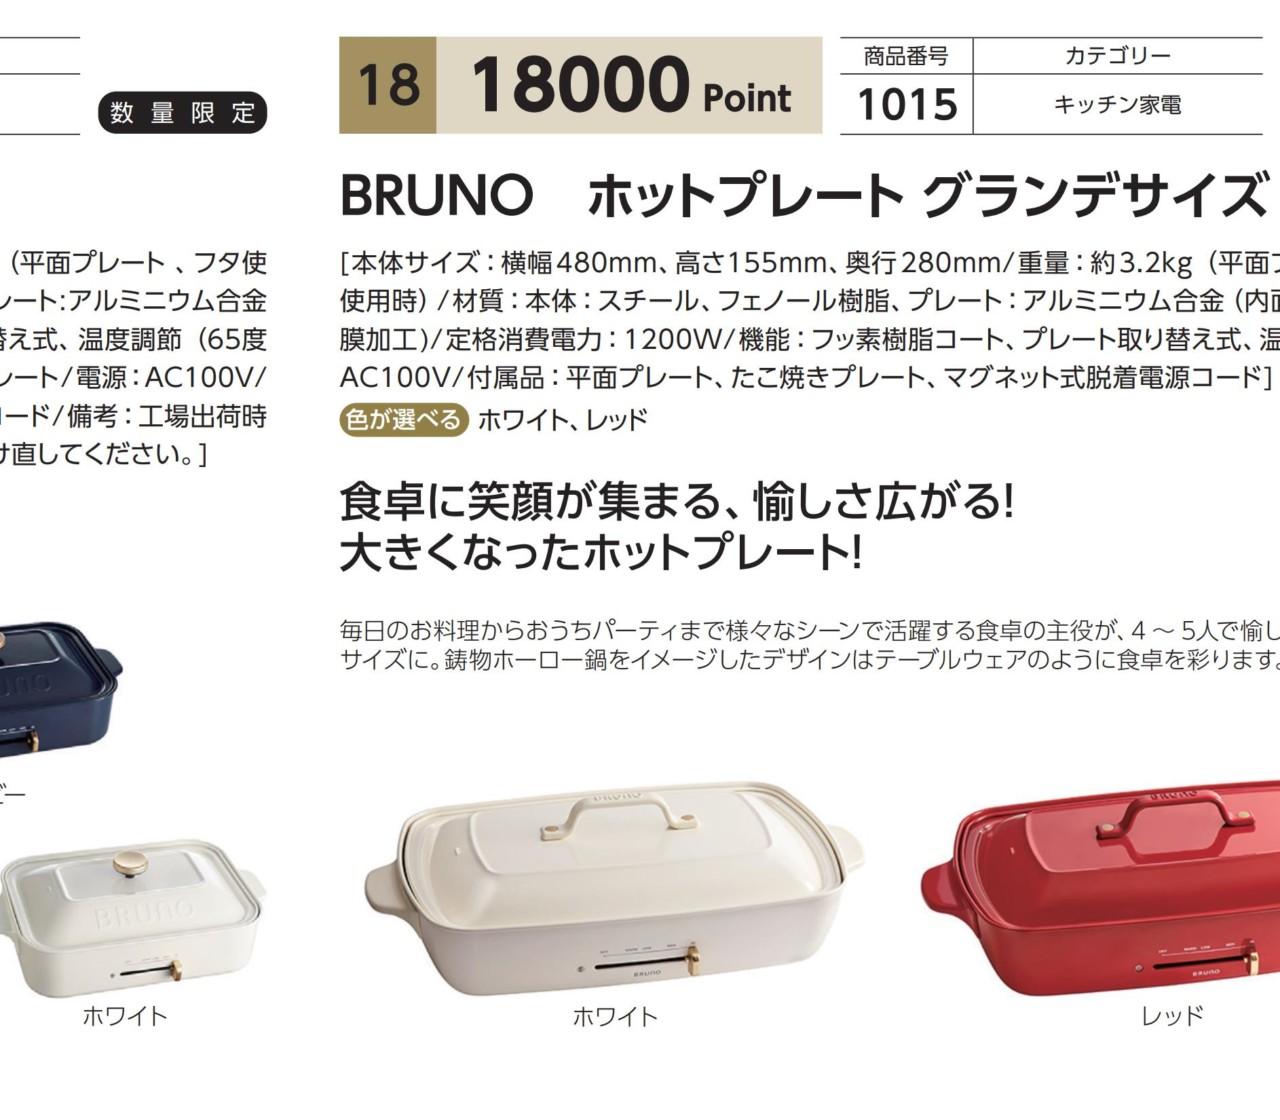 BRUNO(旧イデア)より株主優待